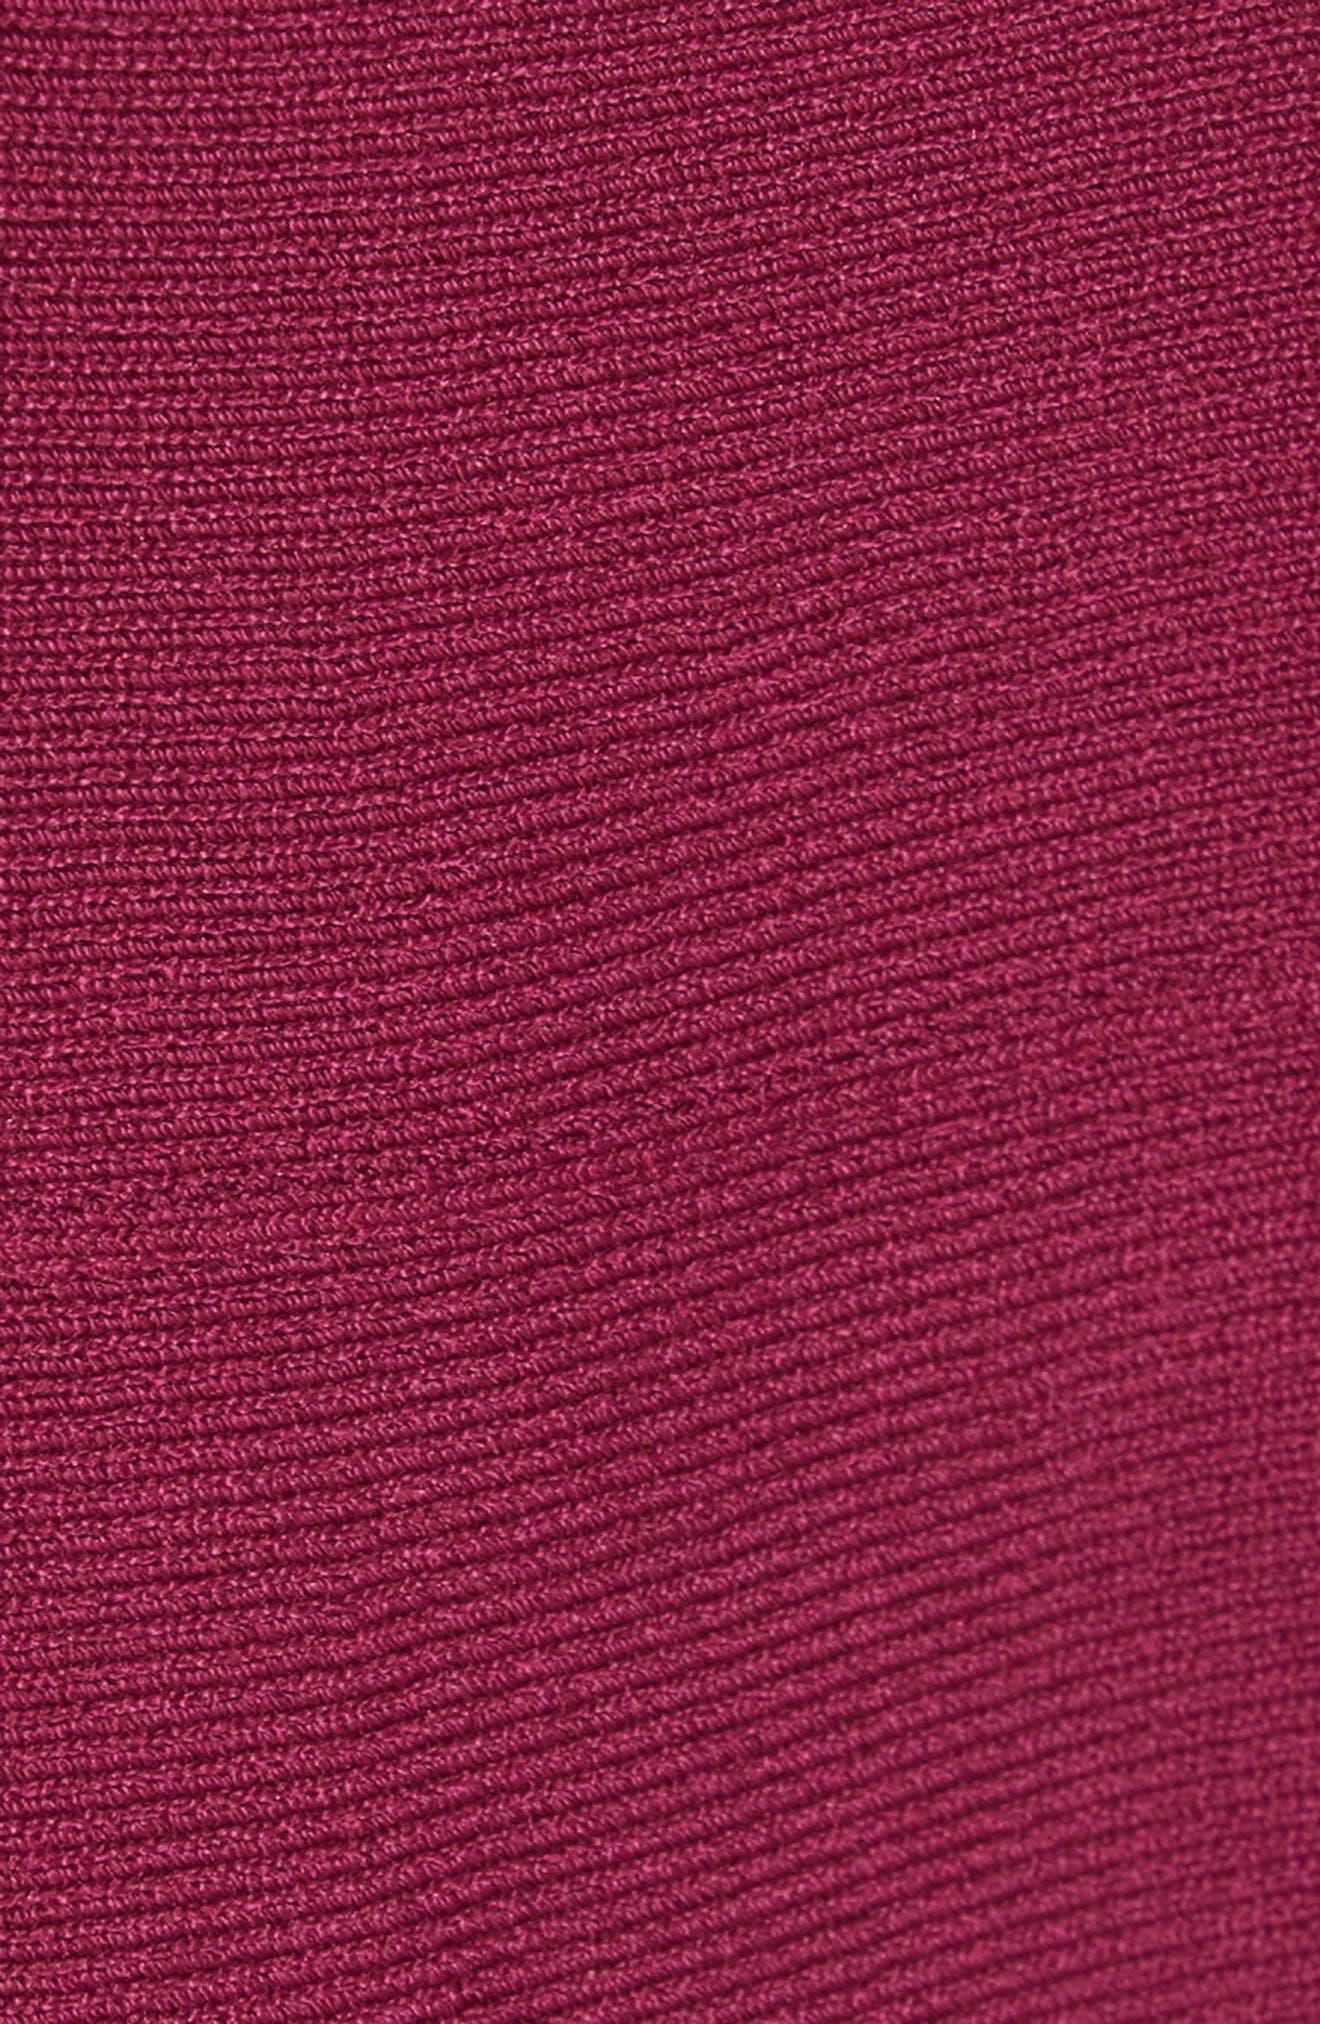 Cherina Bow Detail Fit & Flare Knit Dress,                             Alternate thumbnail 5, color,                             Maroon